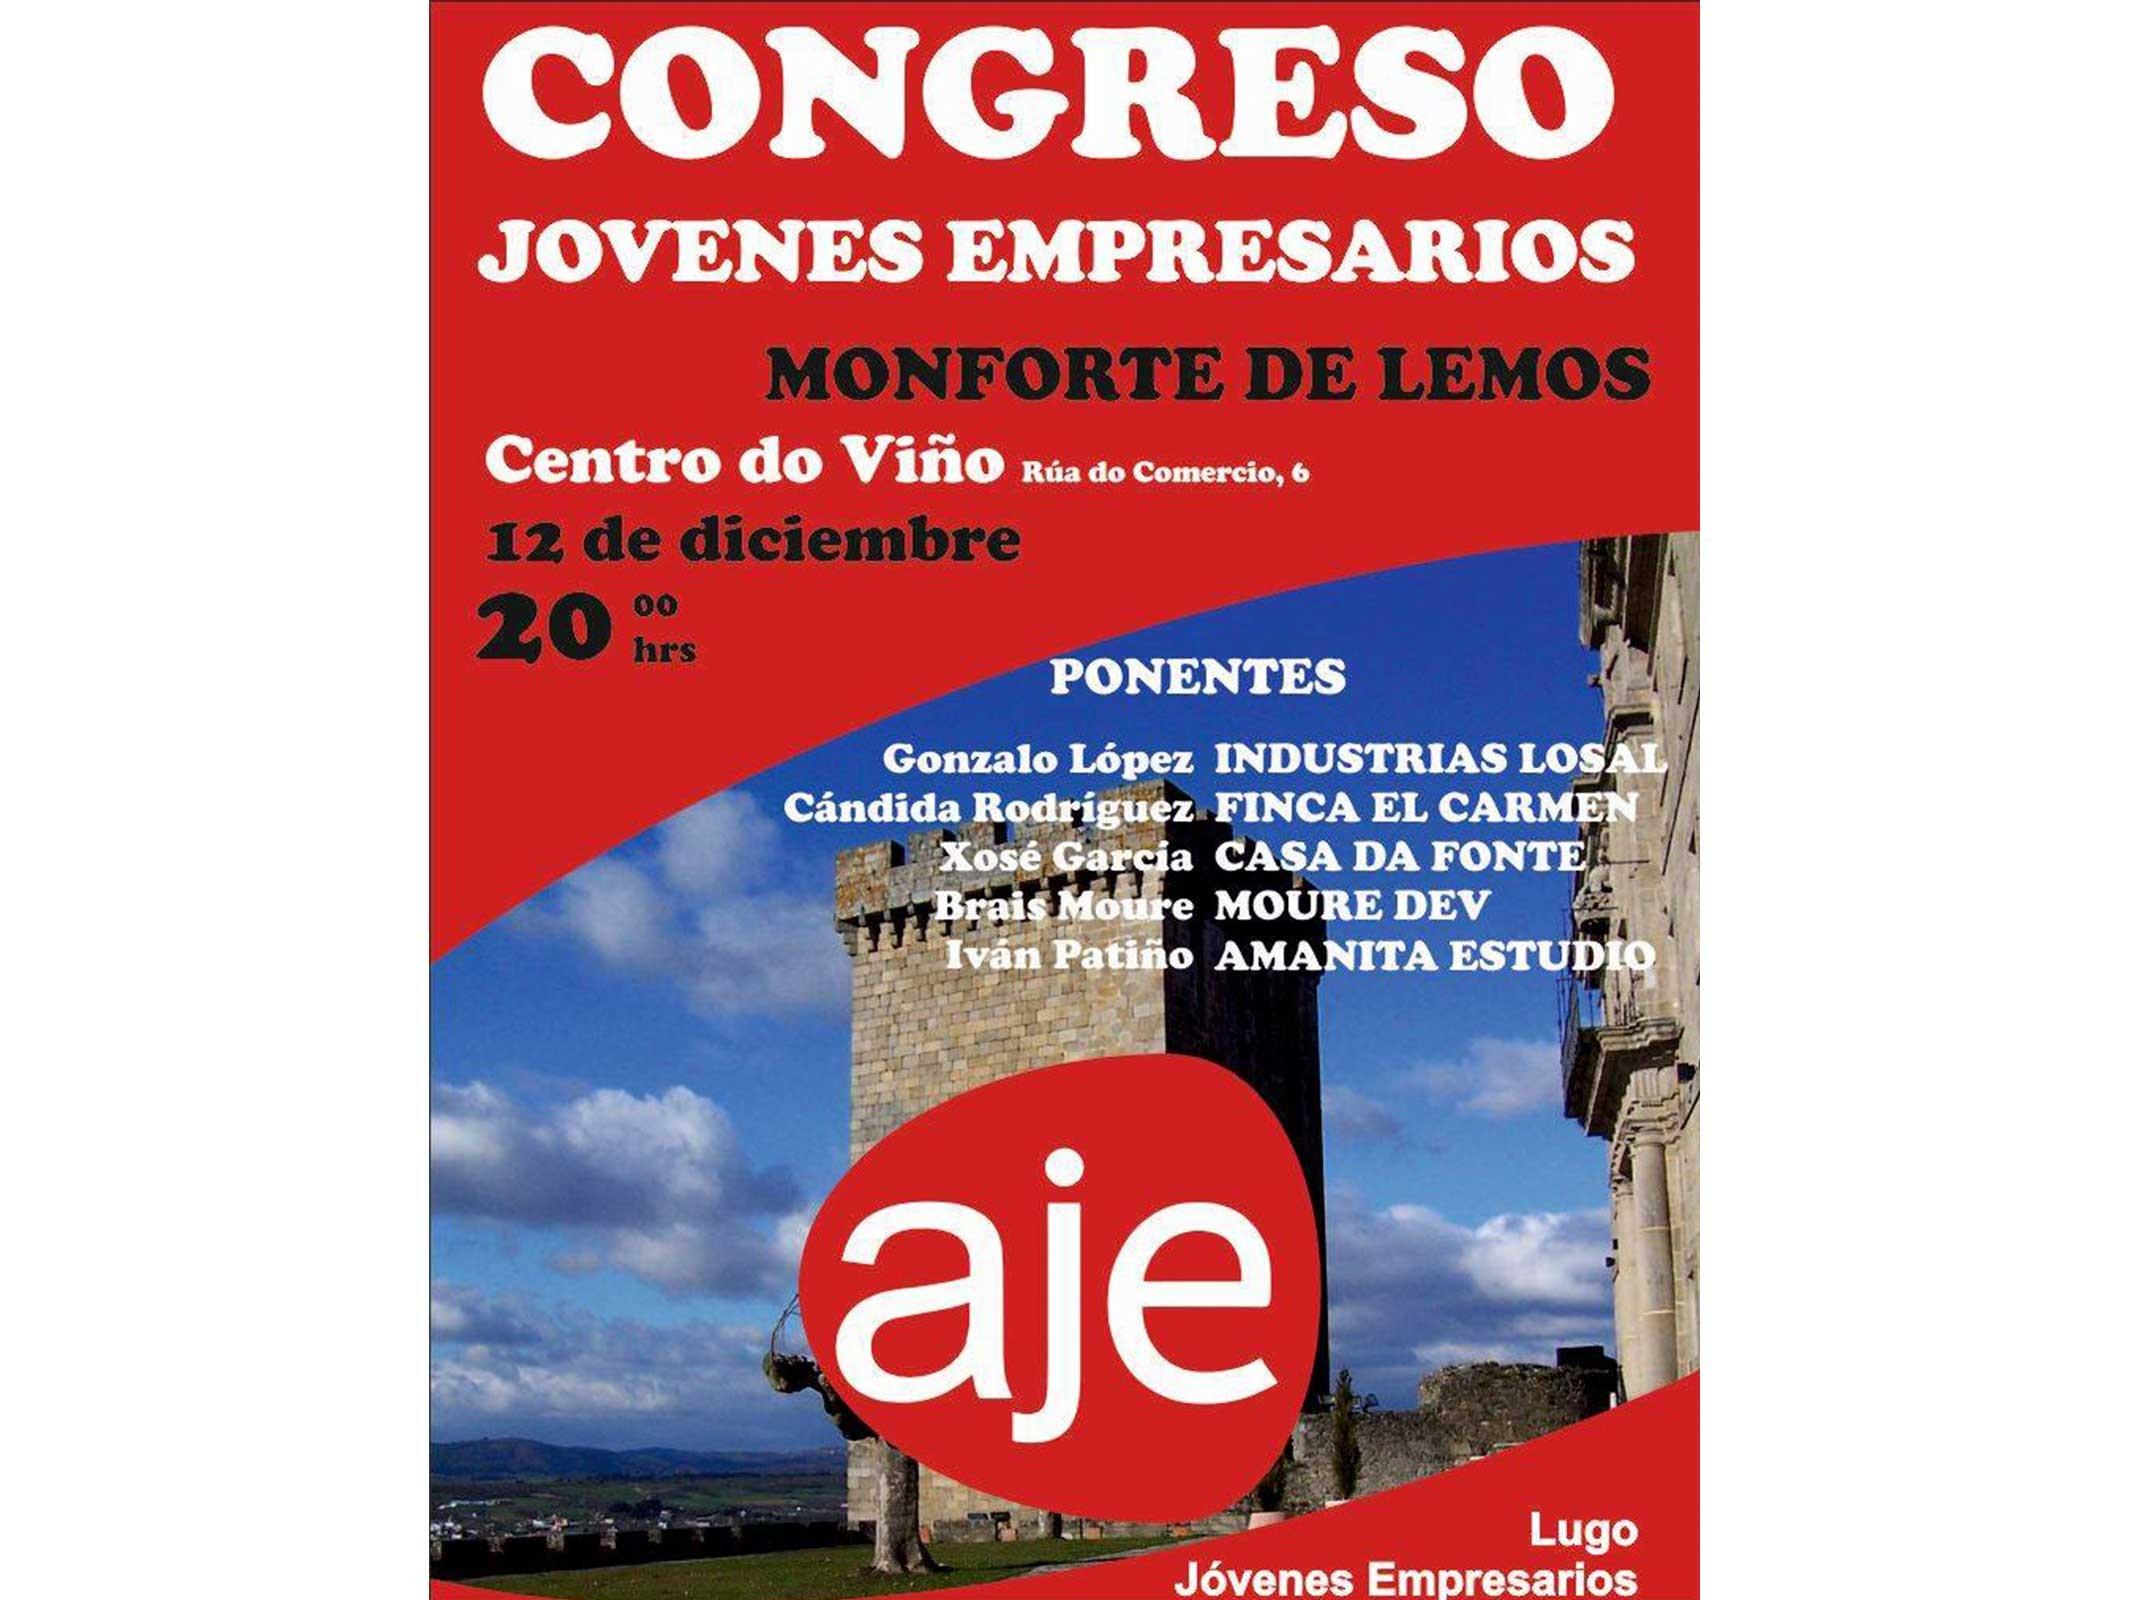 Congreso AJE